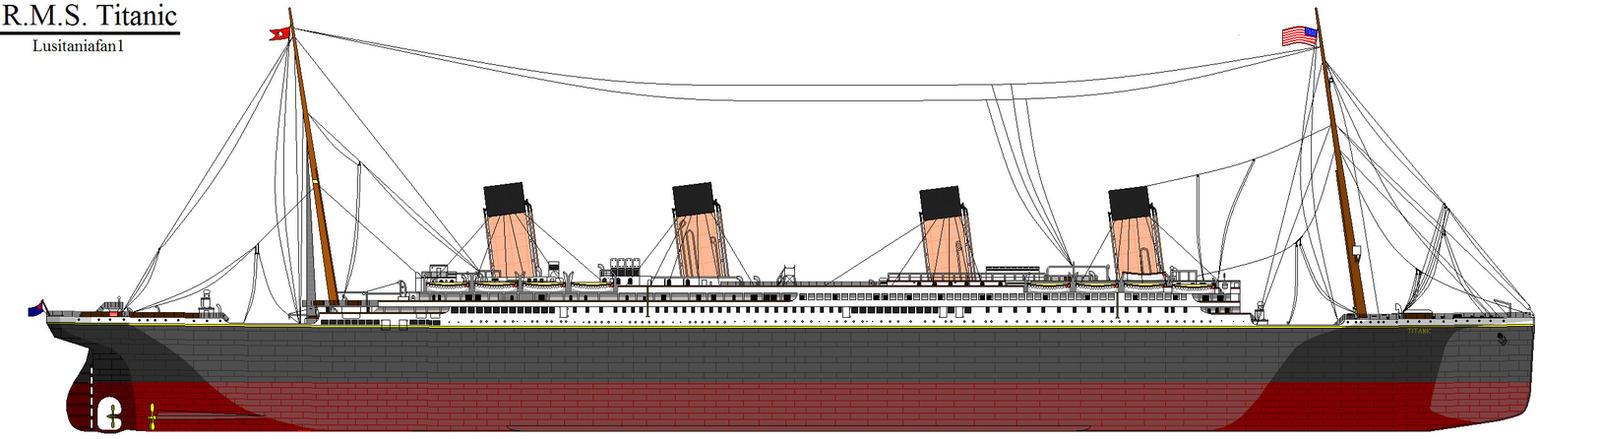 RMS Titanic By Lusitaniafan1 On DeviantArt